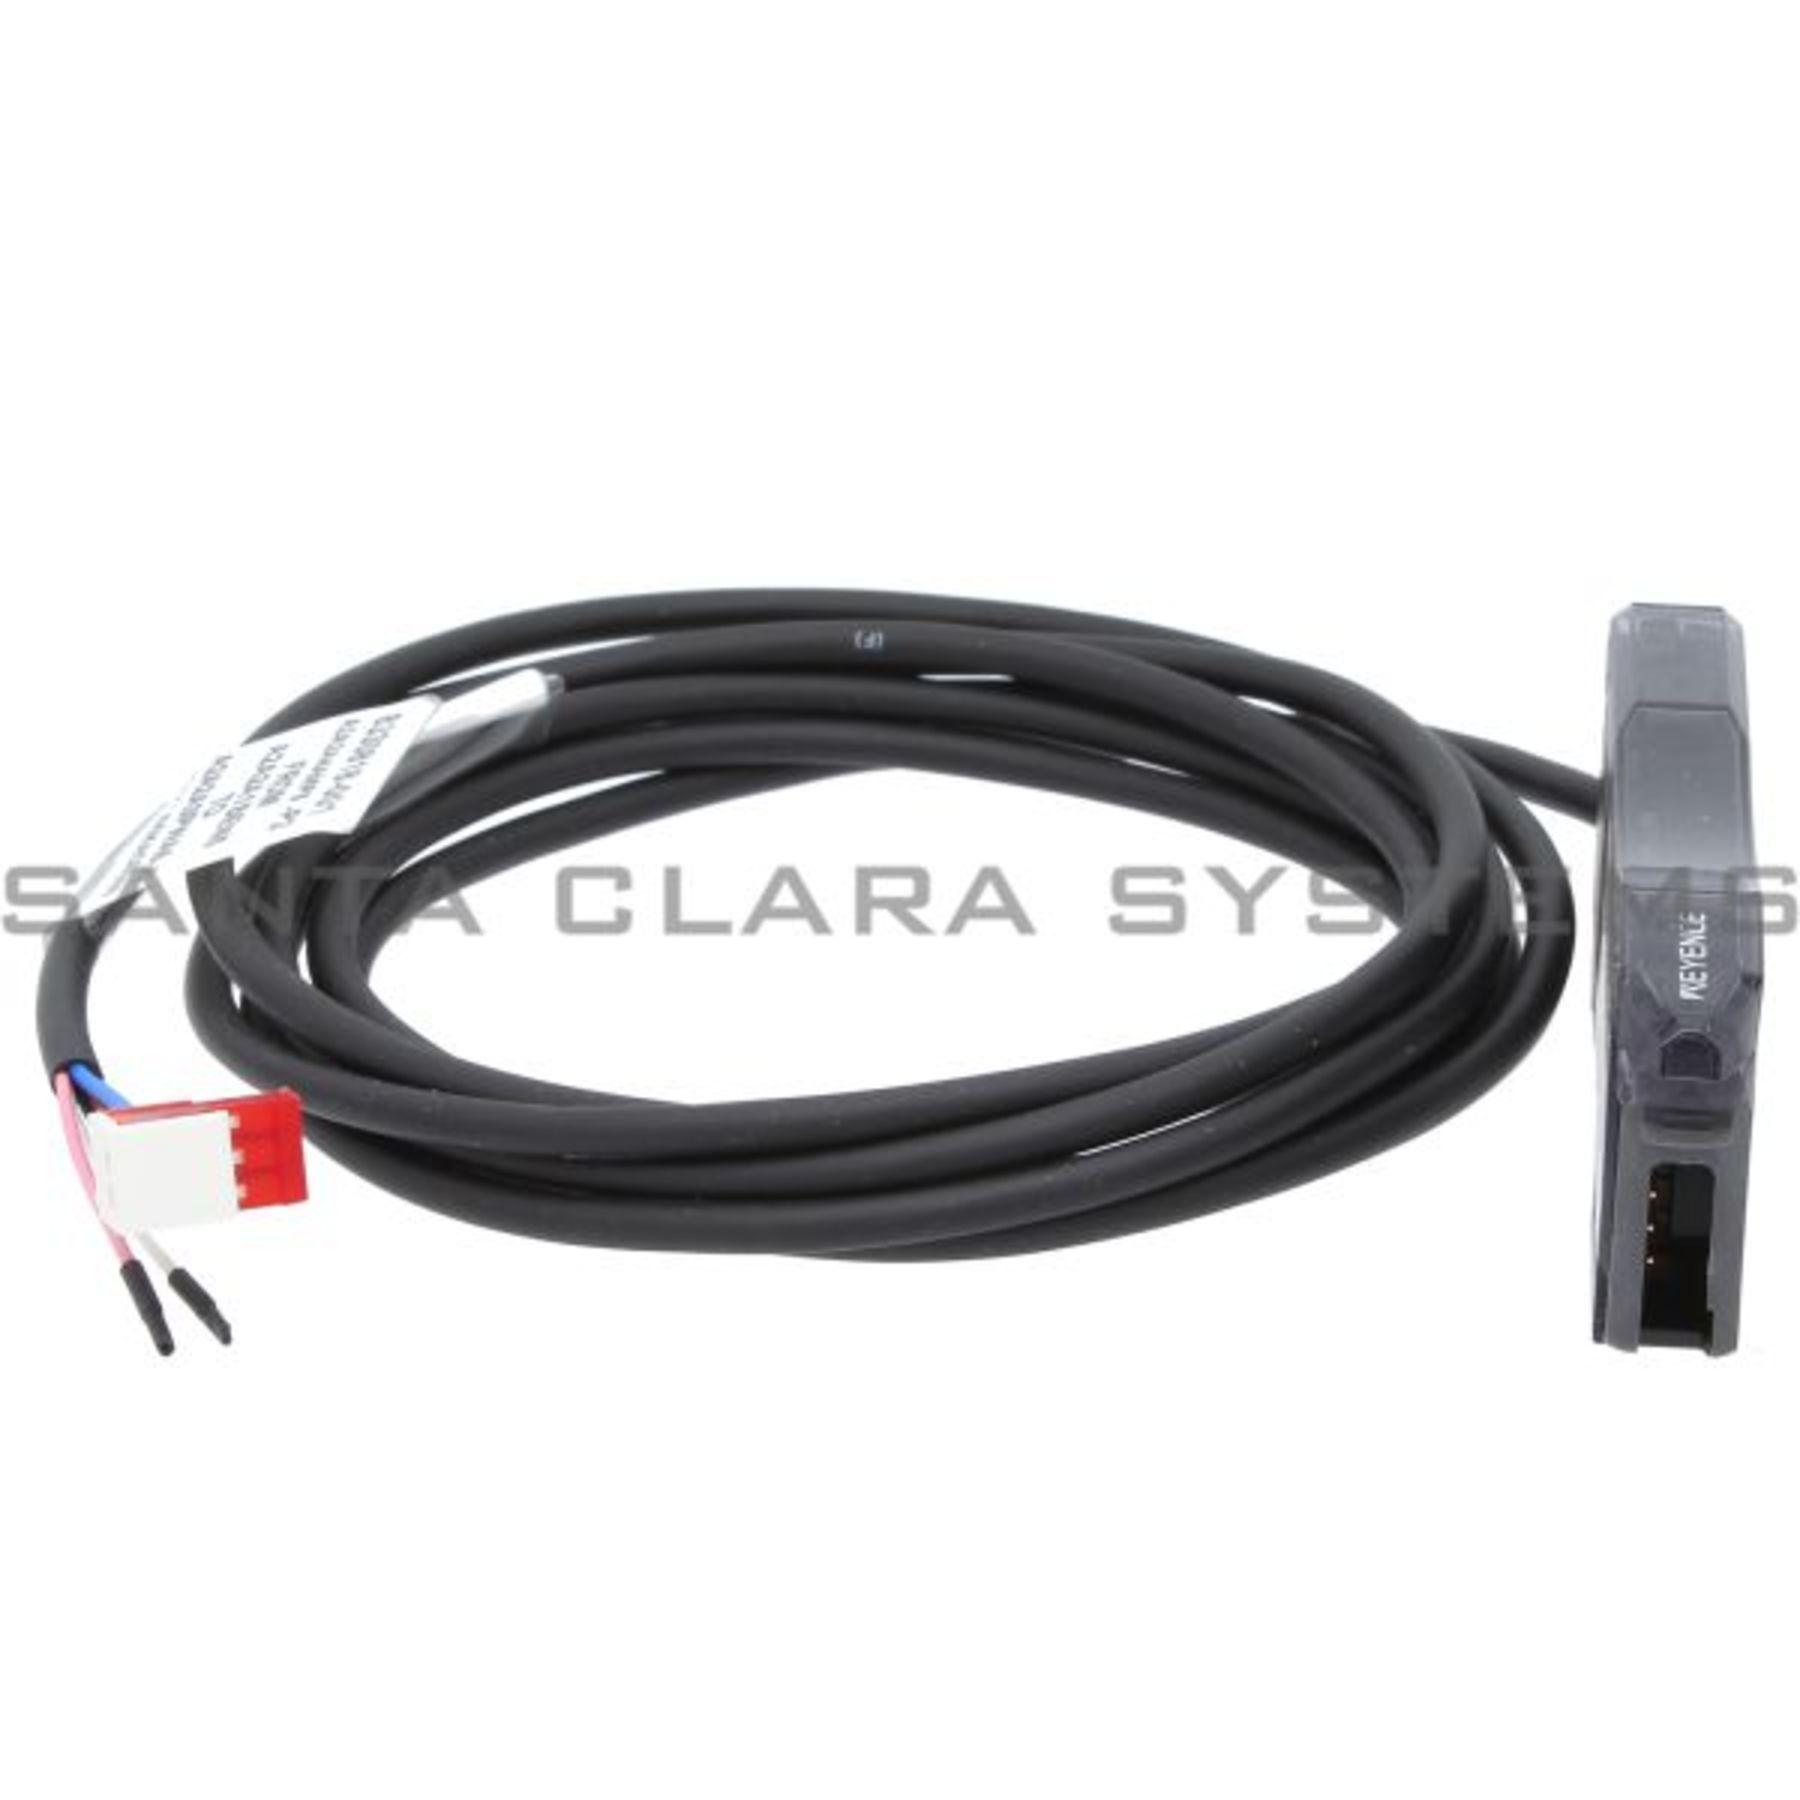 LV-N11N Laser Sensor Keyence In Stock - Santa Clara Systems